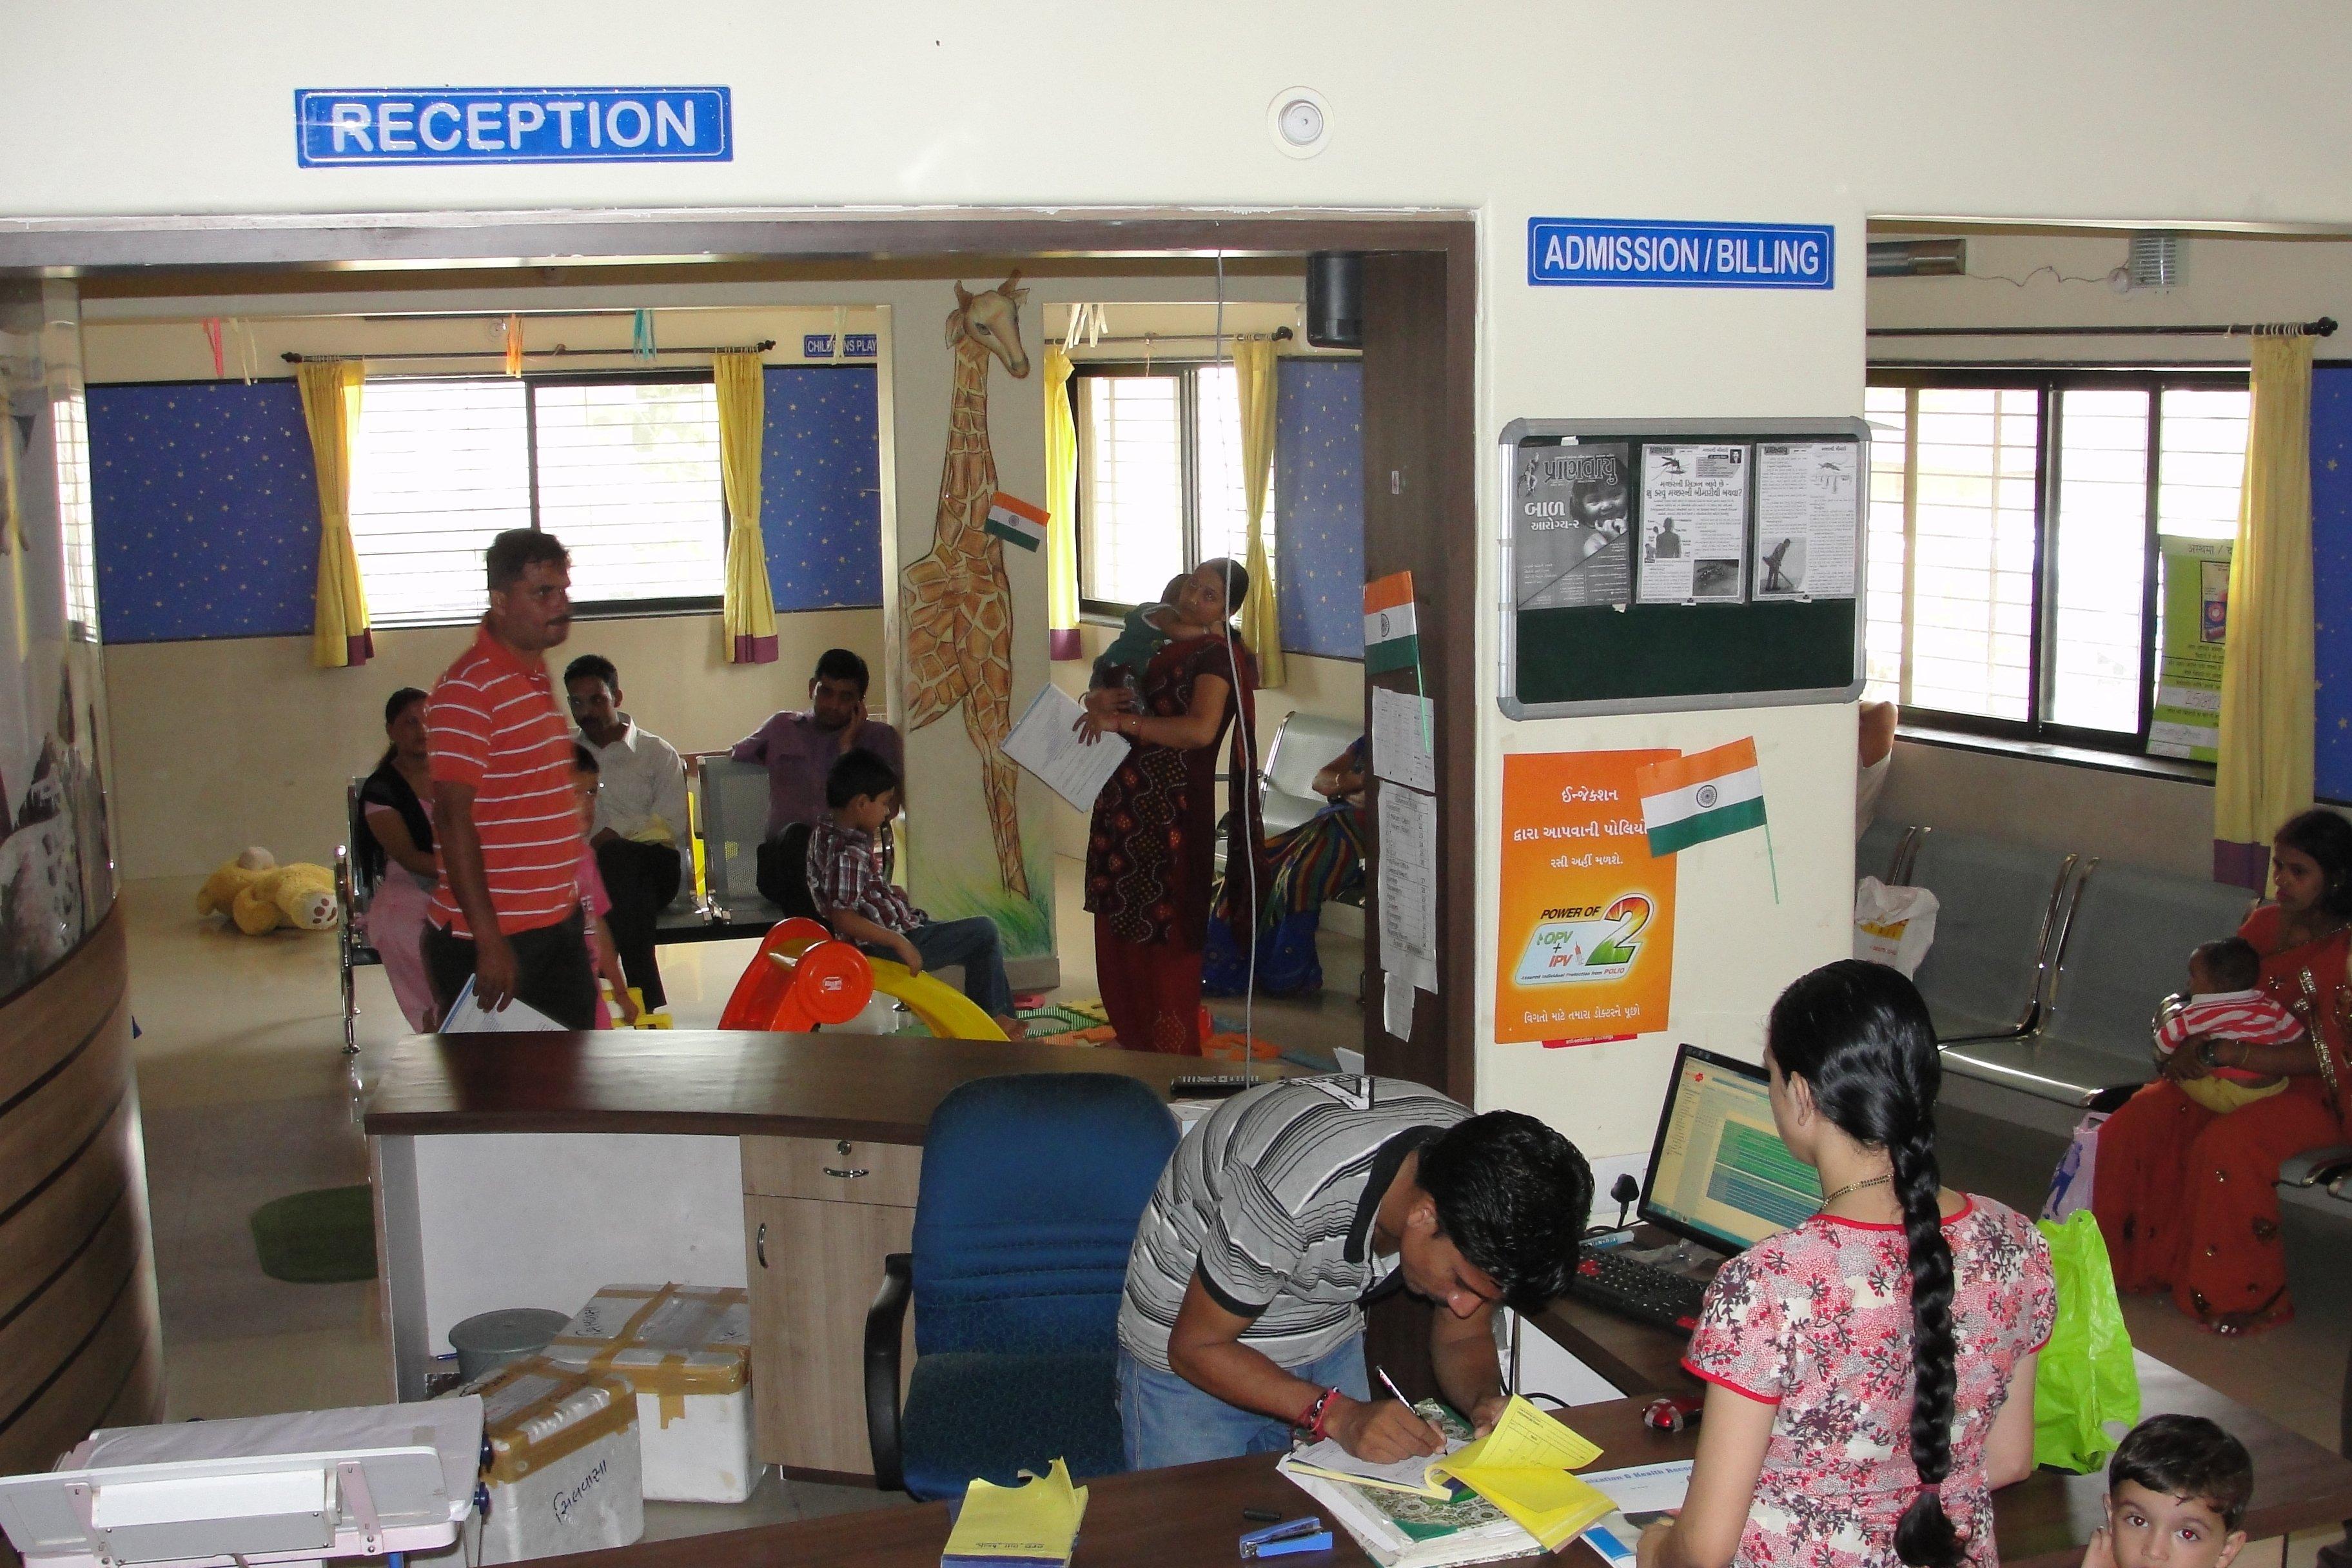 out patient area|Dr Nikam's Sri Sai Marigold Child Care Hospital and NICU|Amli,SILVASSA